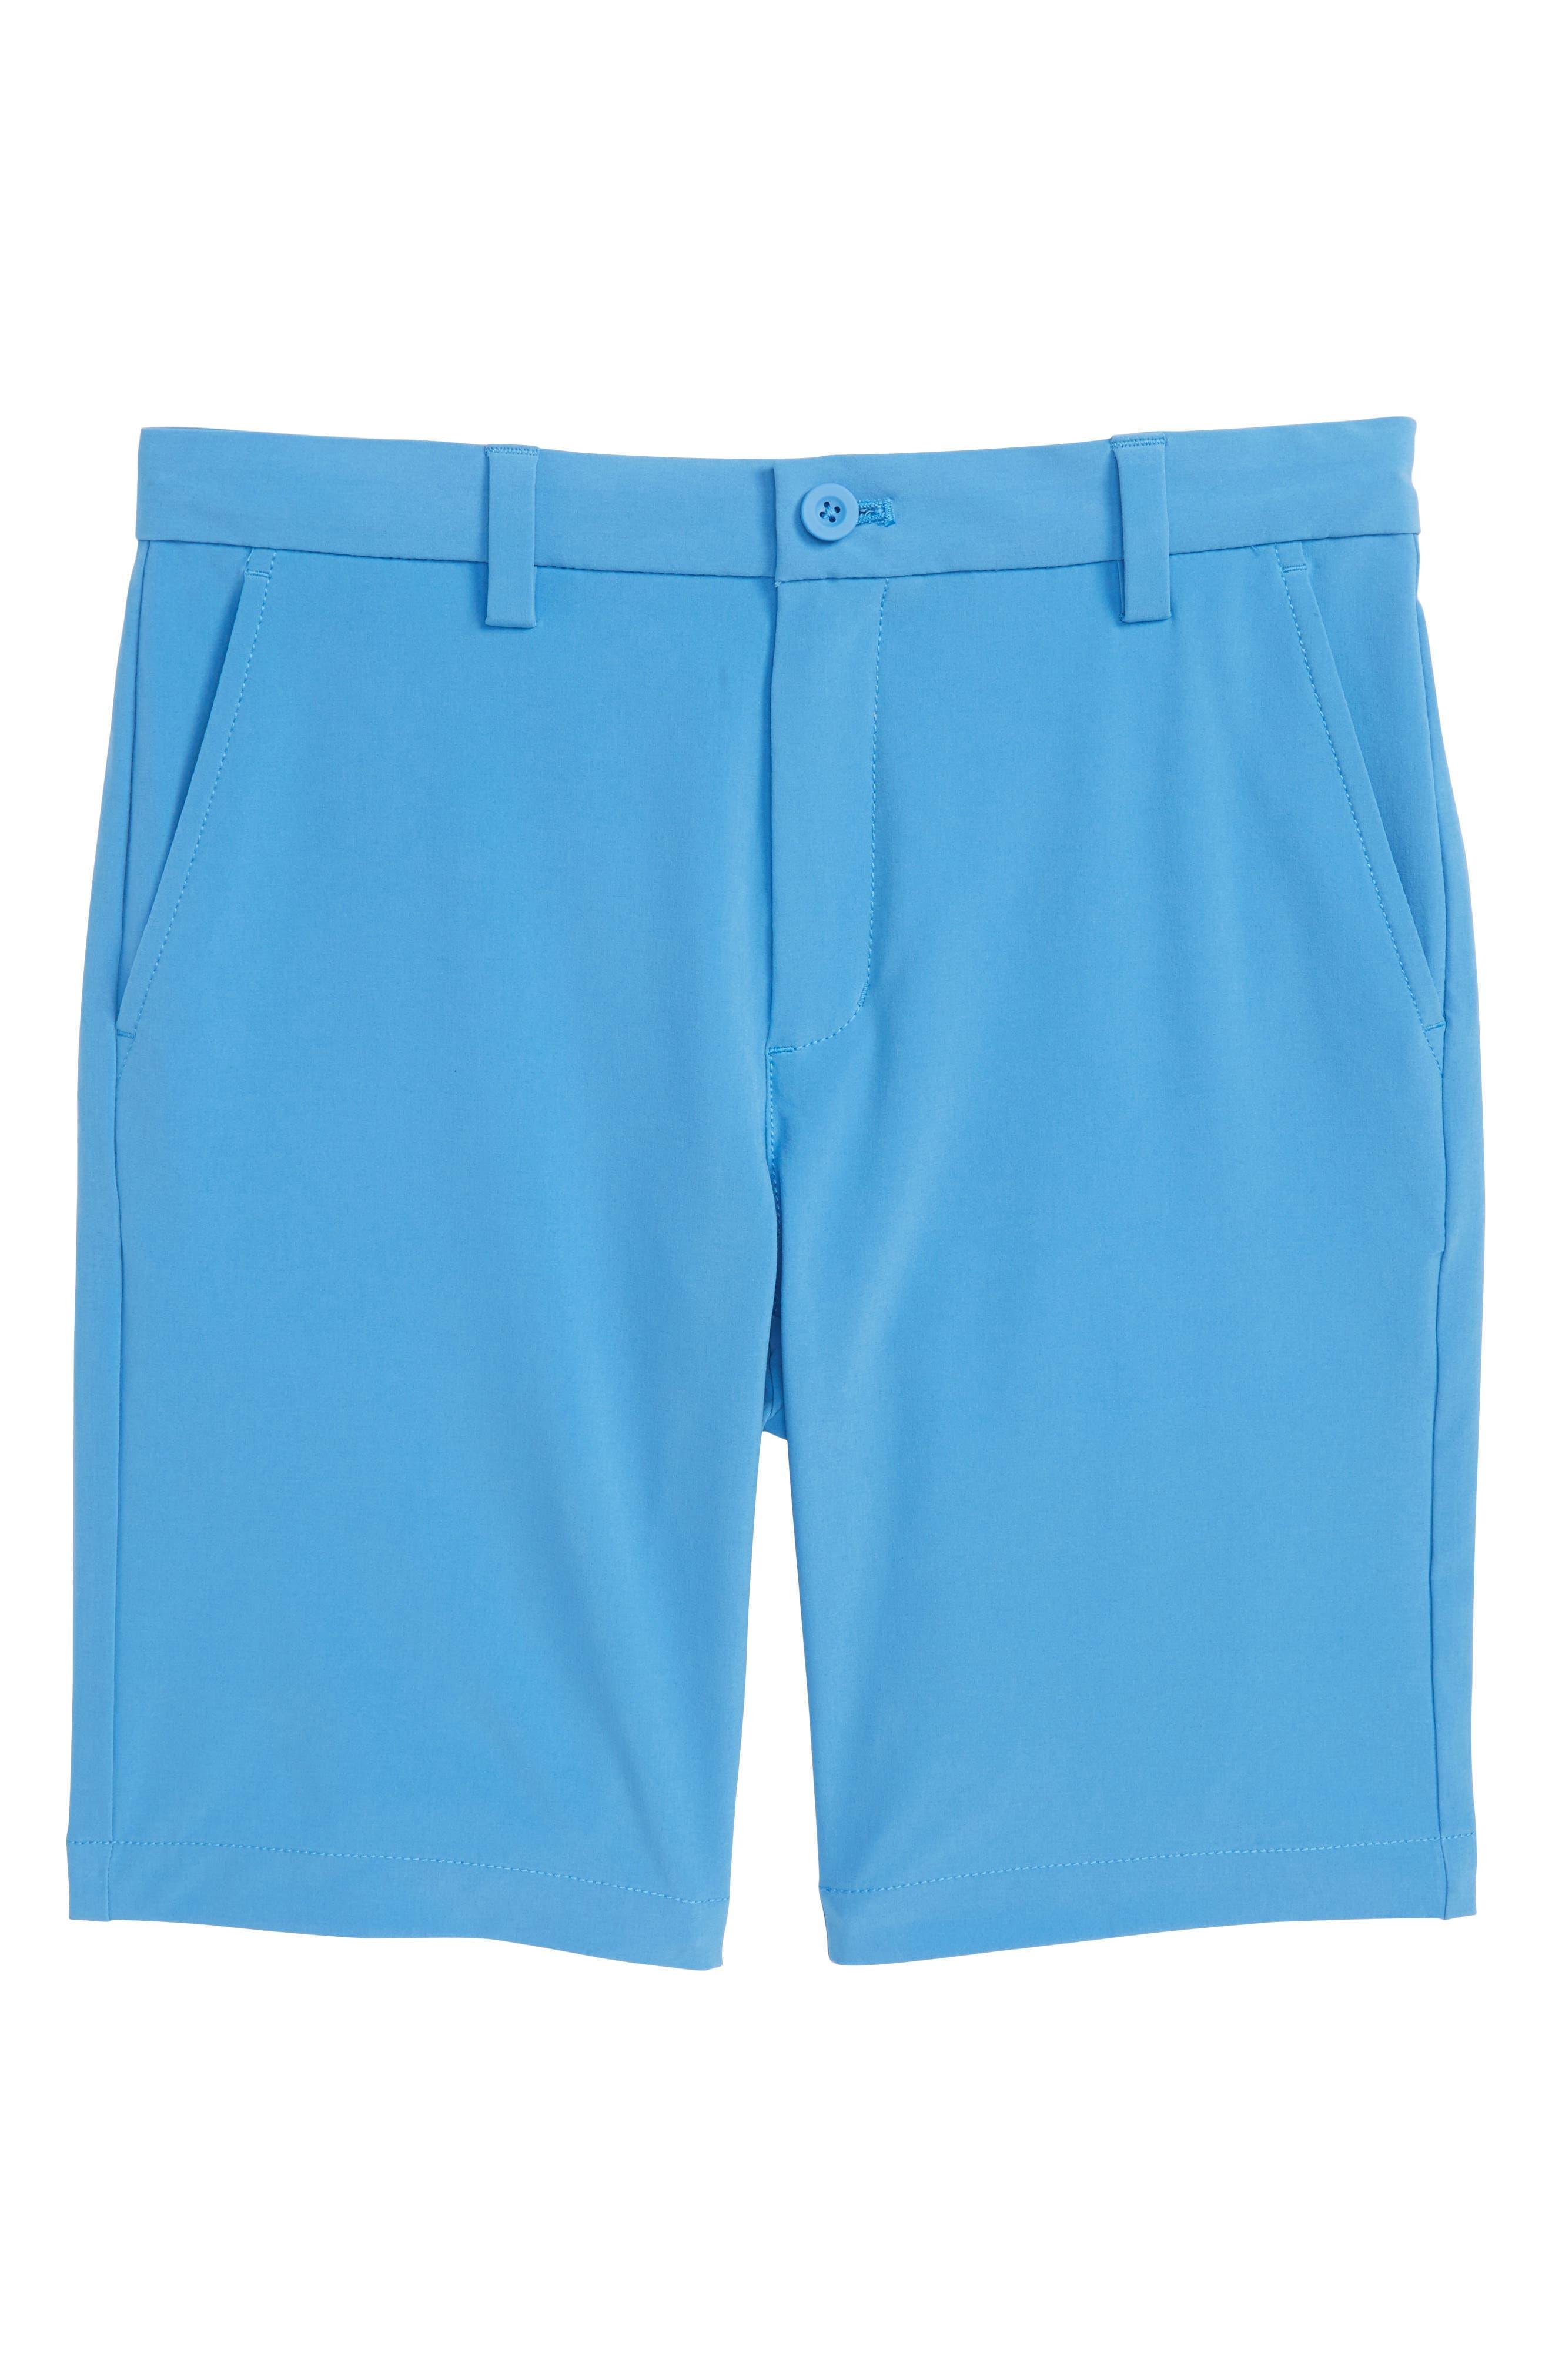 Performance Breaker Shorts,                         Main,                         color, Hull Blue